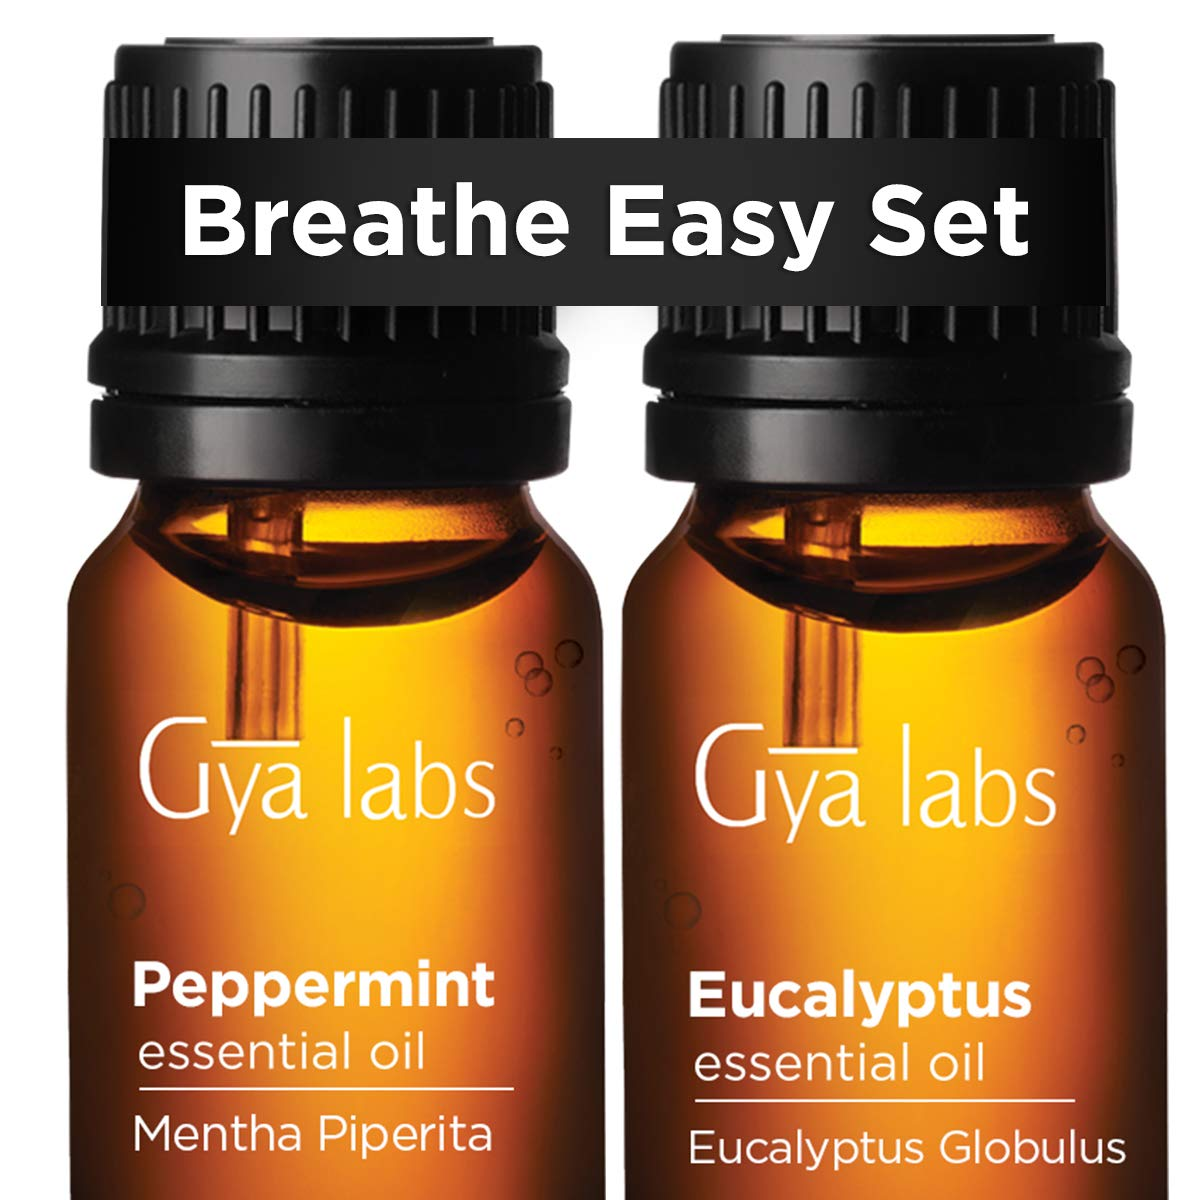 Peppermint Essential Oil & Eucalyptus Oil - Gya Labs Breathe Easy Set For Nausea Relief & Headache Relief - 100% Pure Therapeutic Grade Essential Oils Set for Congestion Relief & Purify Air - 2x10ml